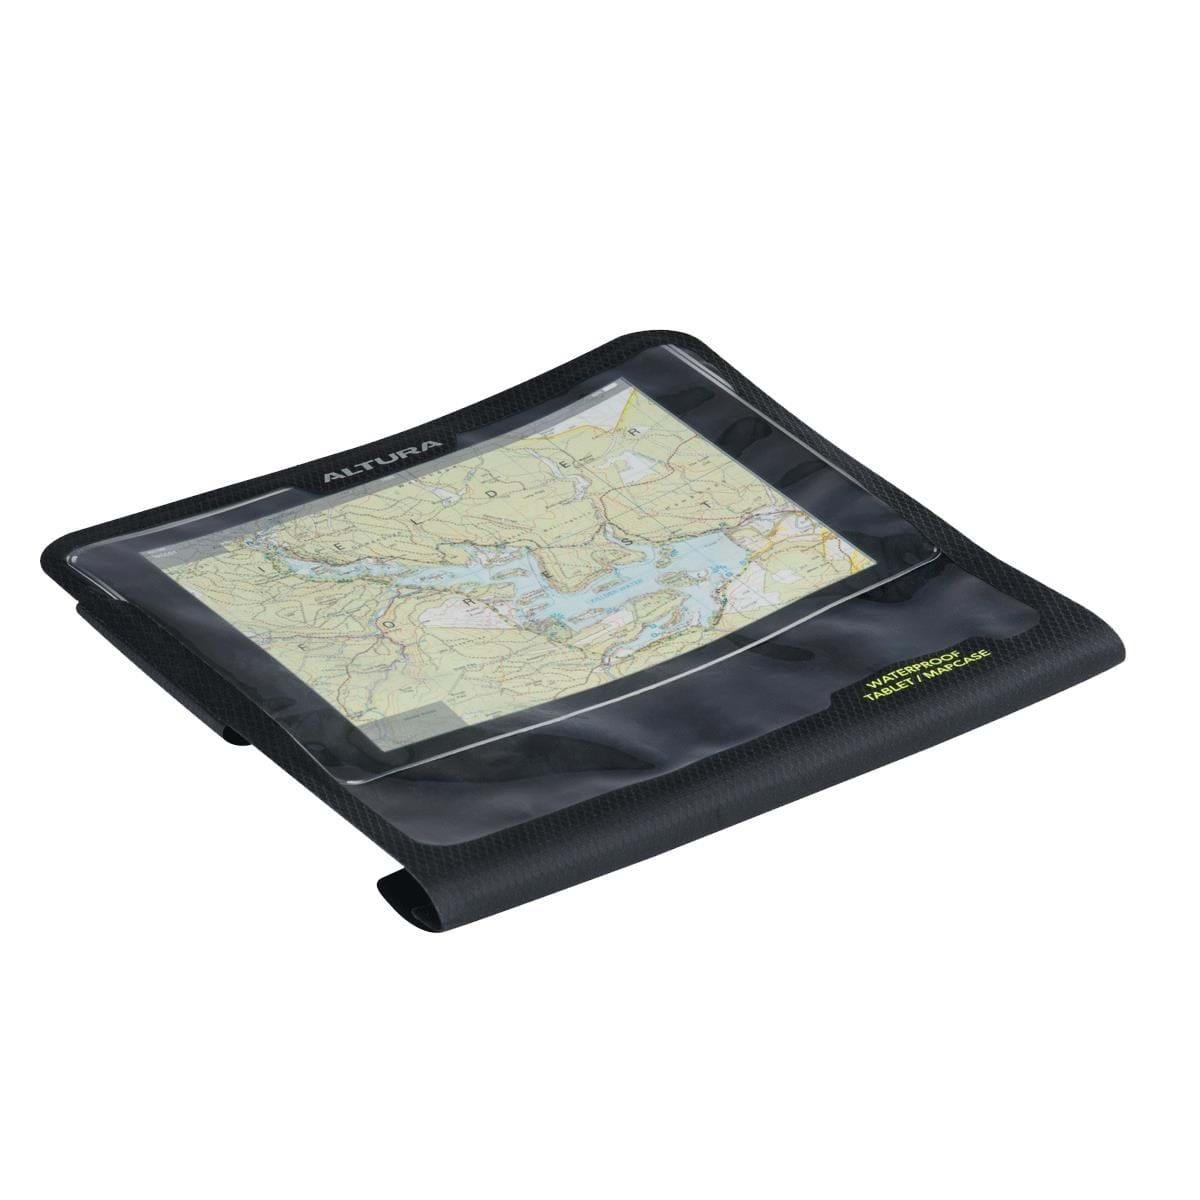 Waterproof Tablet/Map case